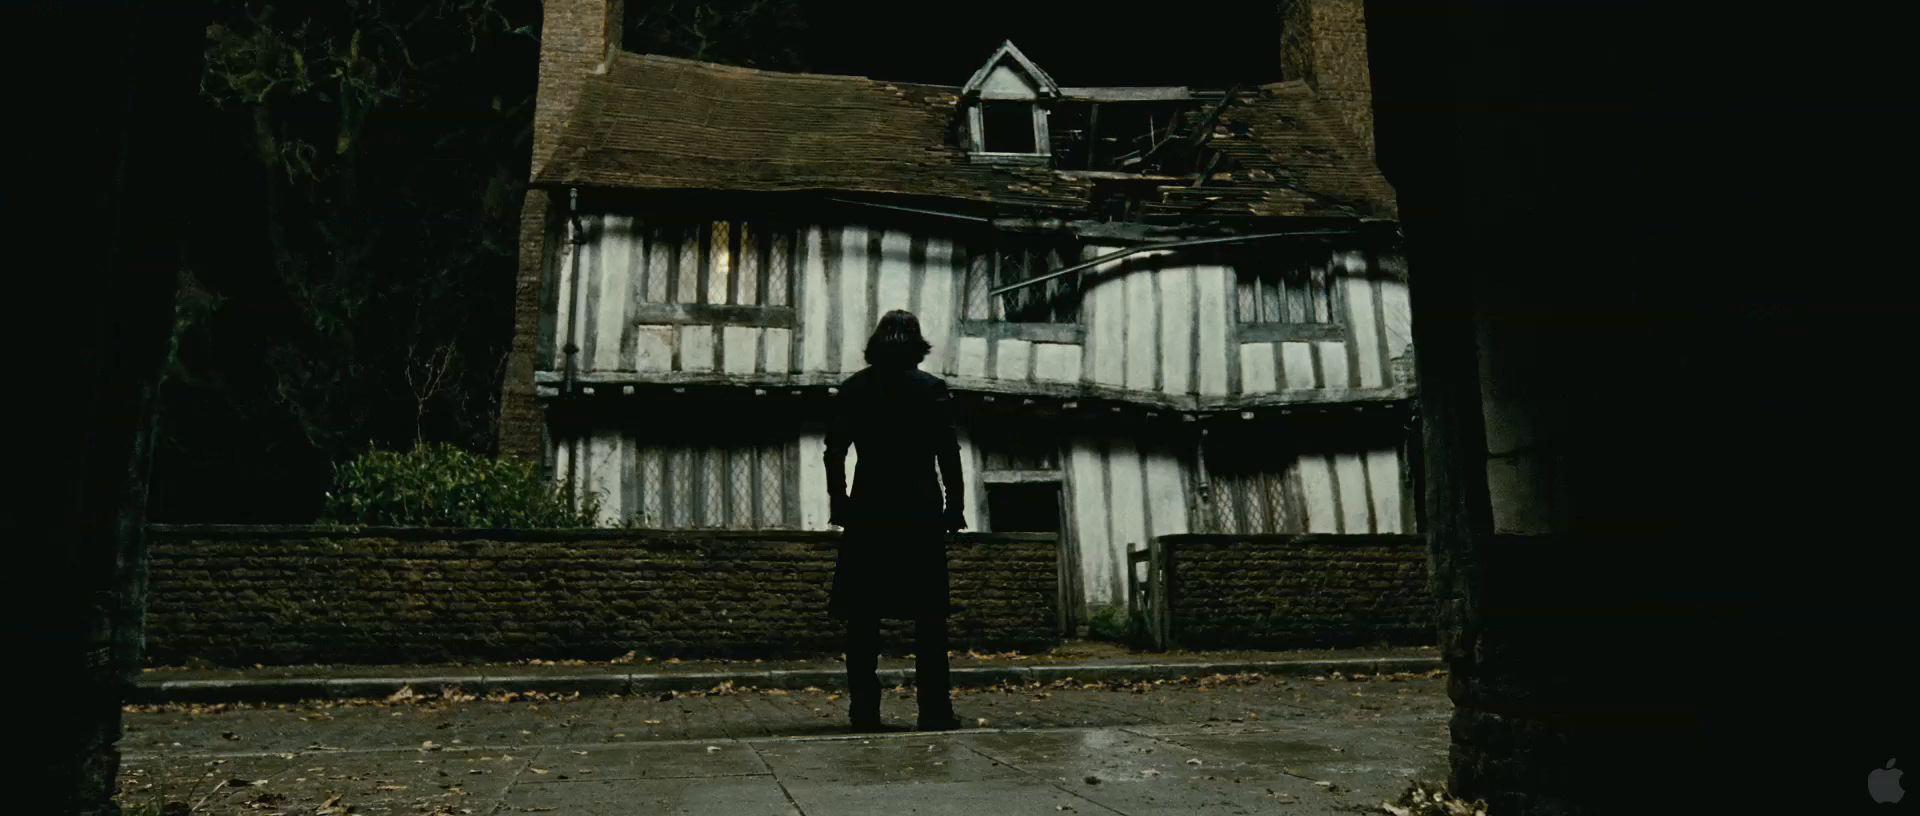 Harry Potter BlogHogwarts HP7 2 Trailer 26